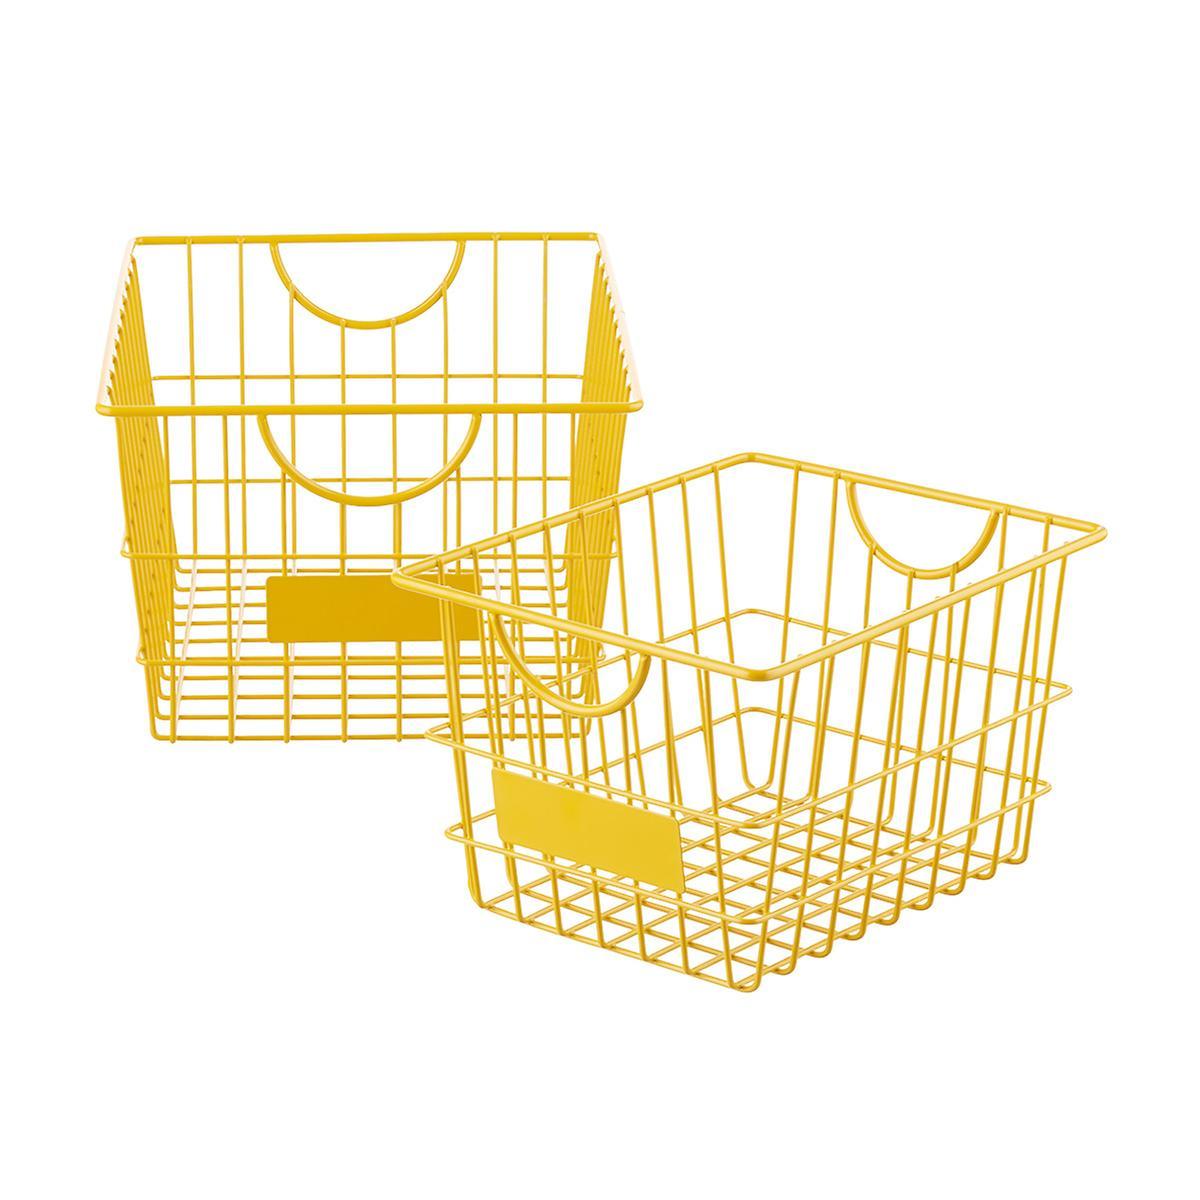 10078156g-wire-storage-basket-with-l